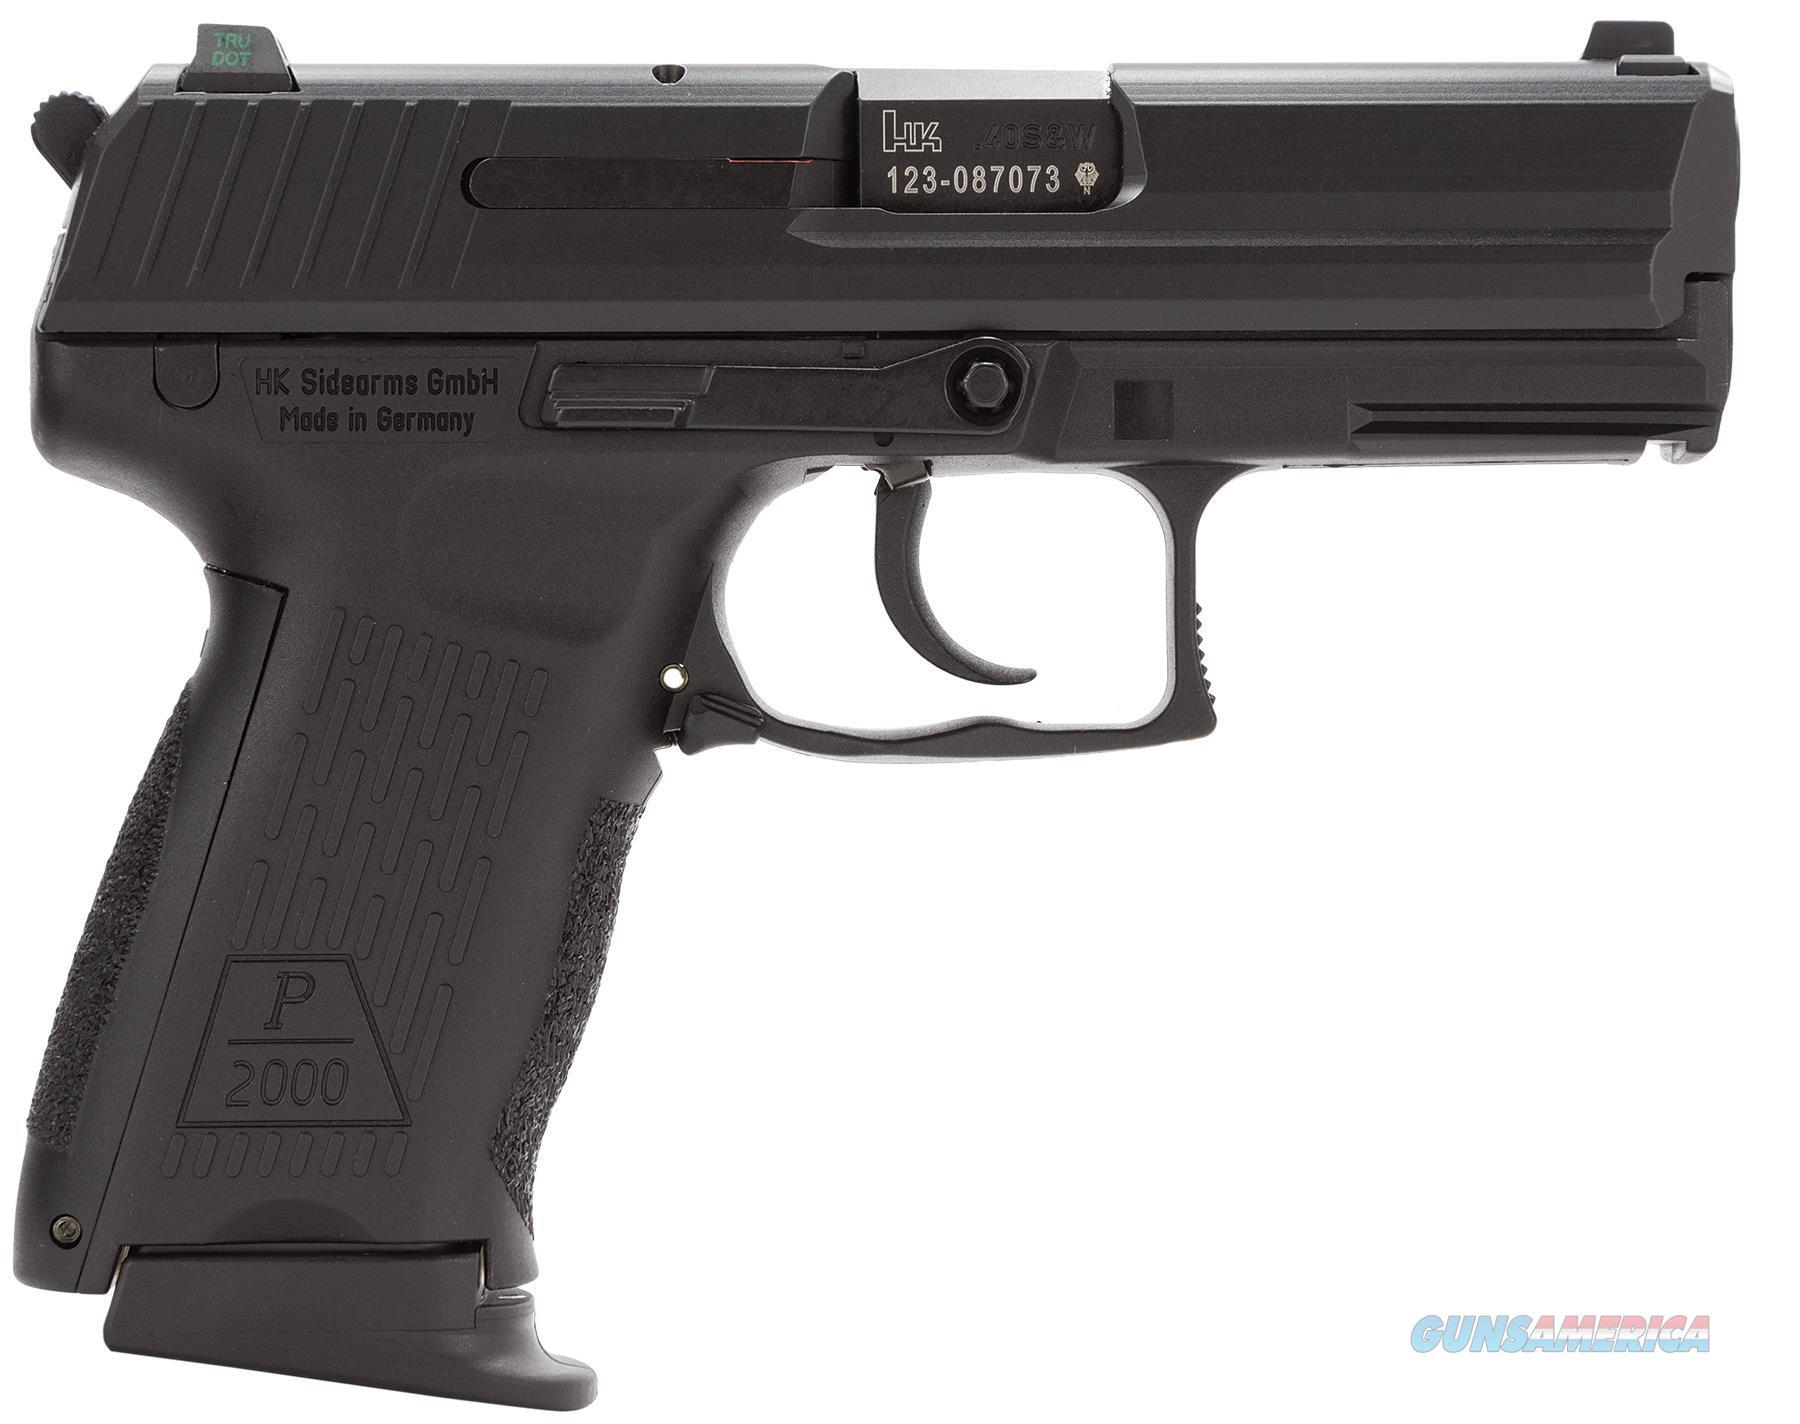 "Heckler & Koch 704303Lea5 P2000sk V3 *Ca/Ma Compliant* Single/Double 40 Smith & Wesson (S&W) 3.26"" 9+1 Black Interchangeable Backstrap Grip Black 704303LEA5  Guns > Pistols > H Misc Pistols"